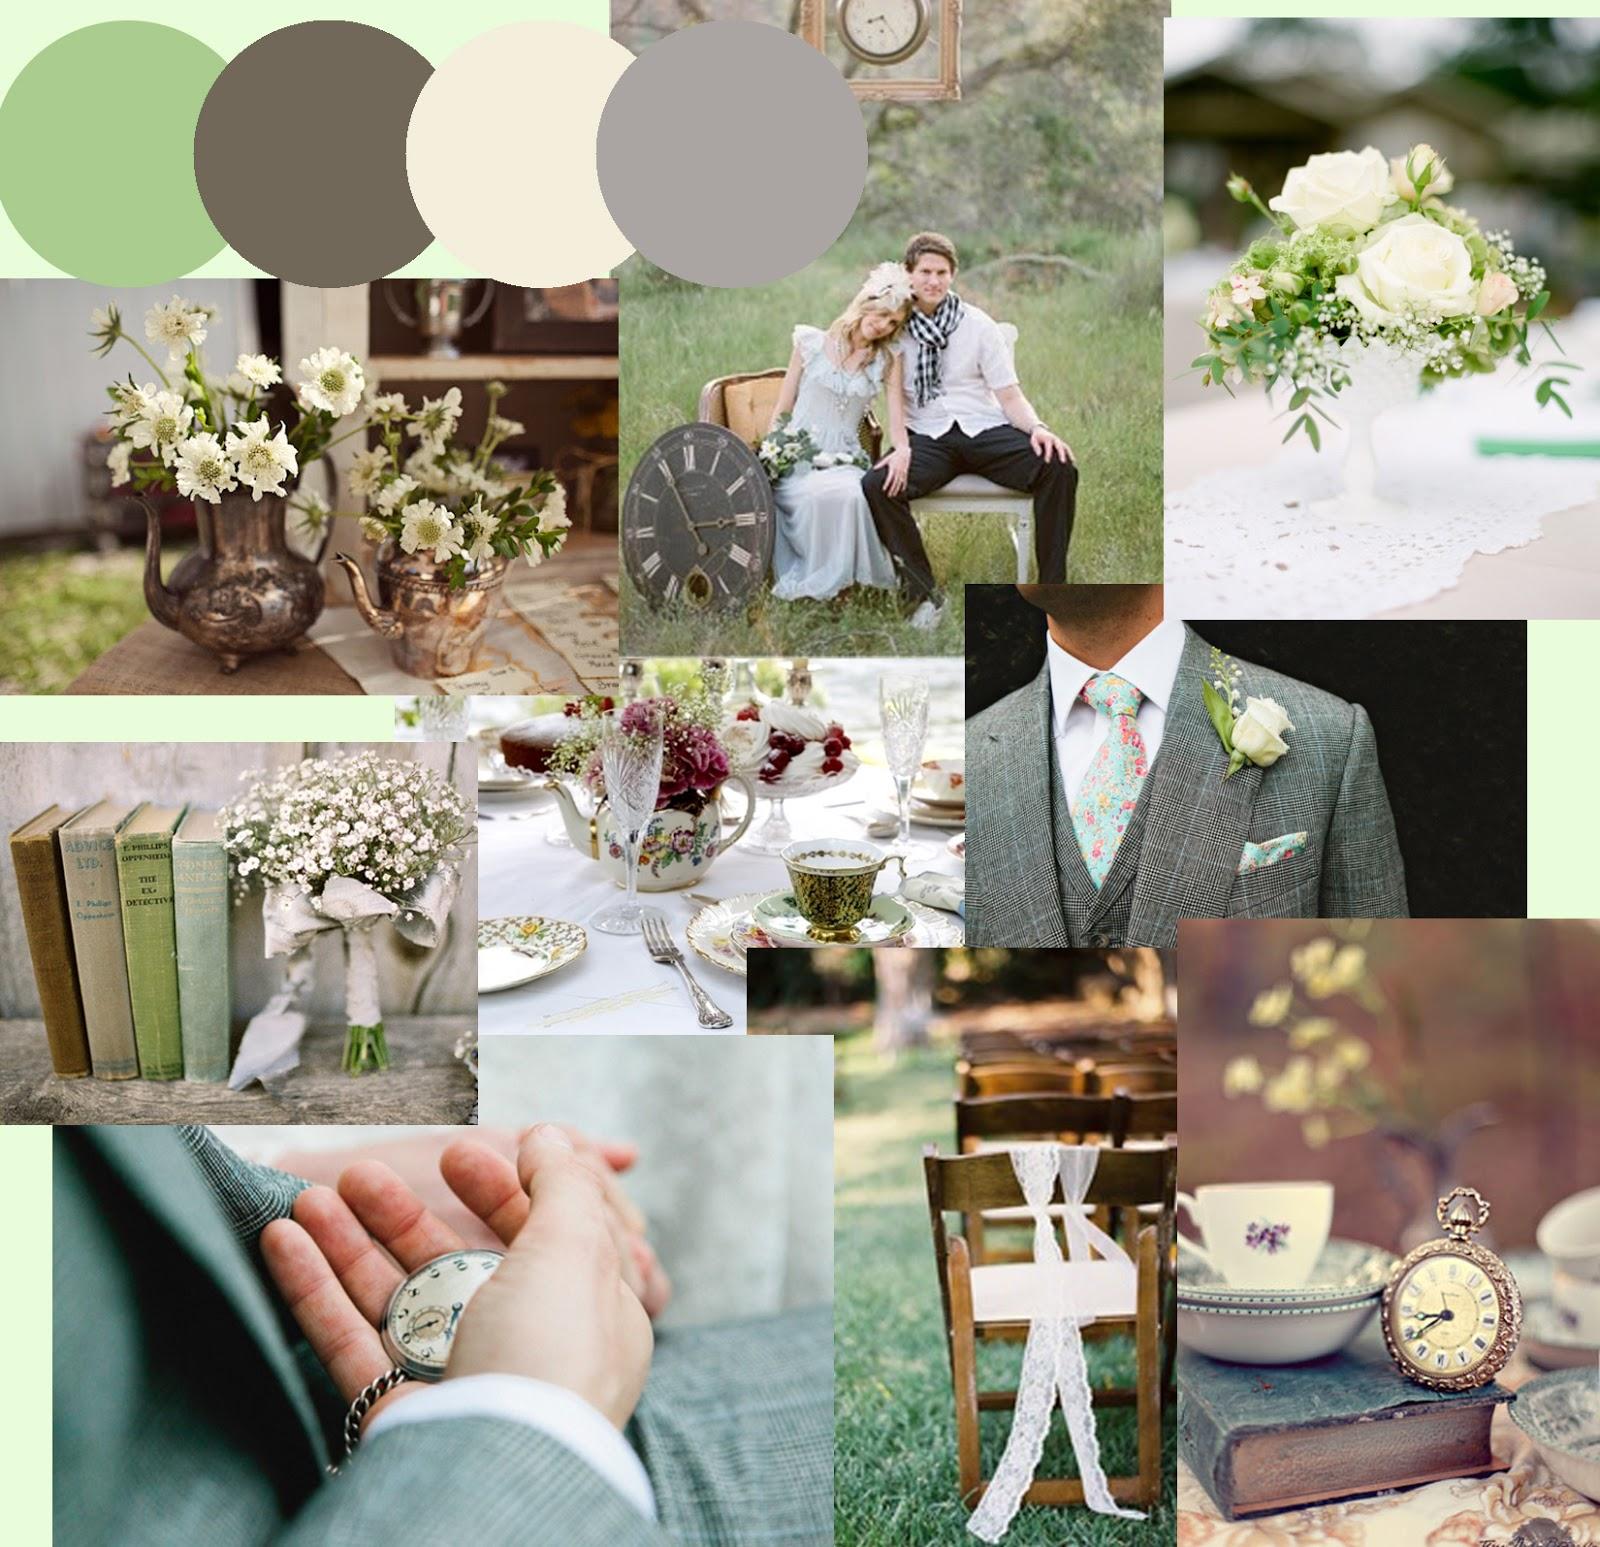 A Pretty Green Wonderland Wedding Theme Stationery